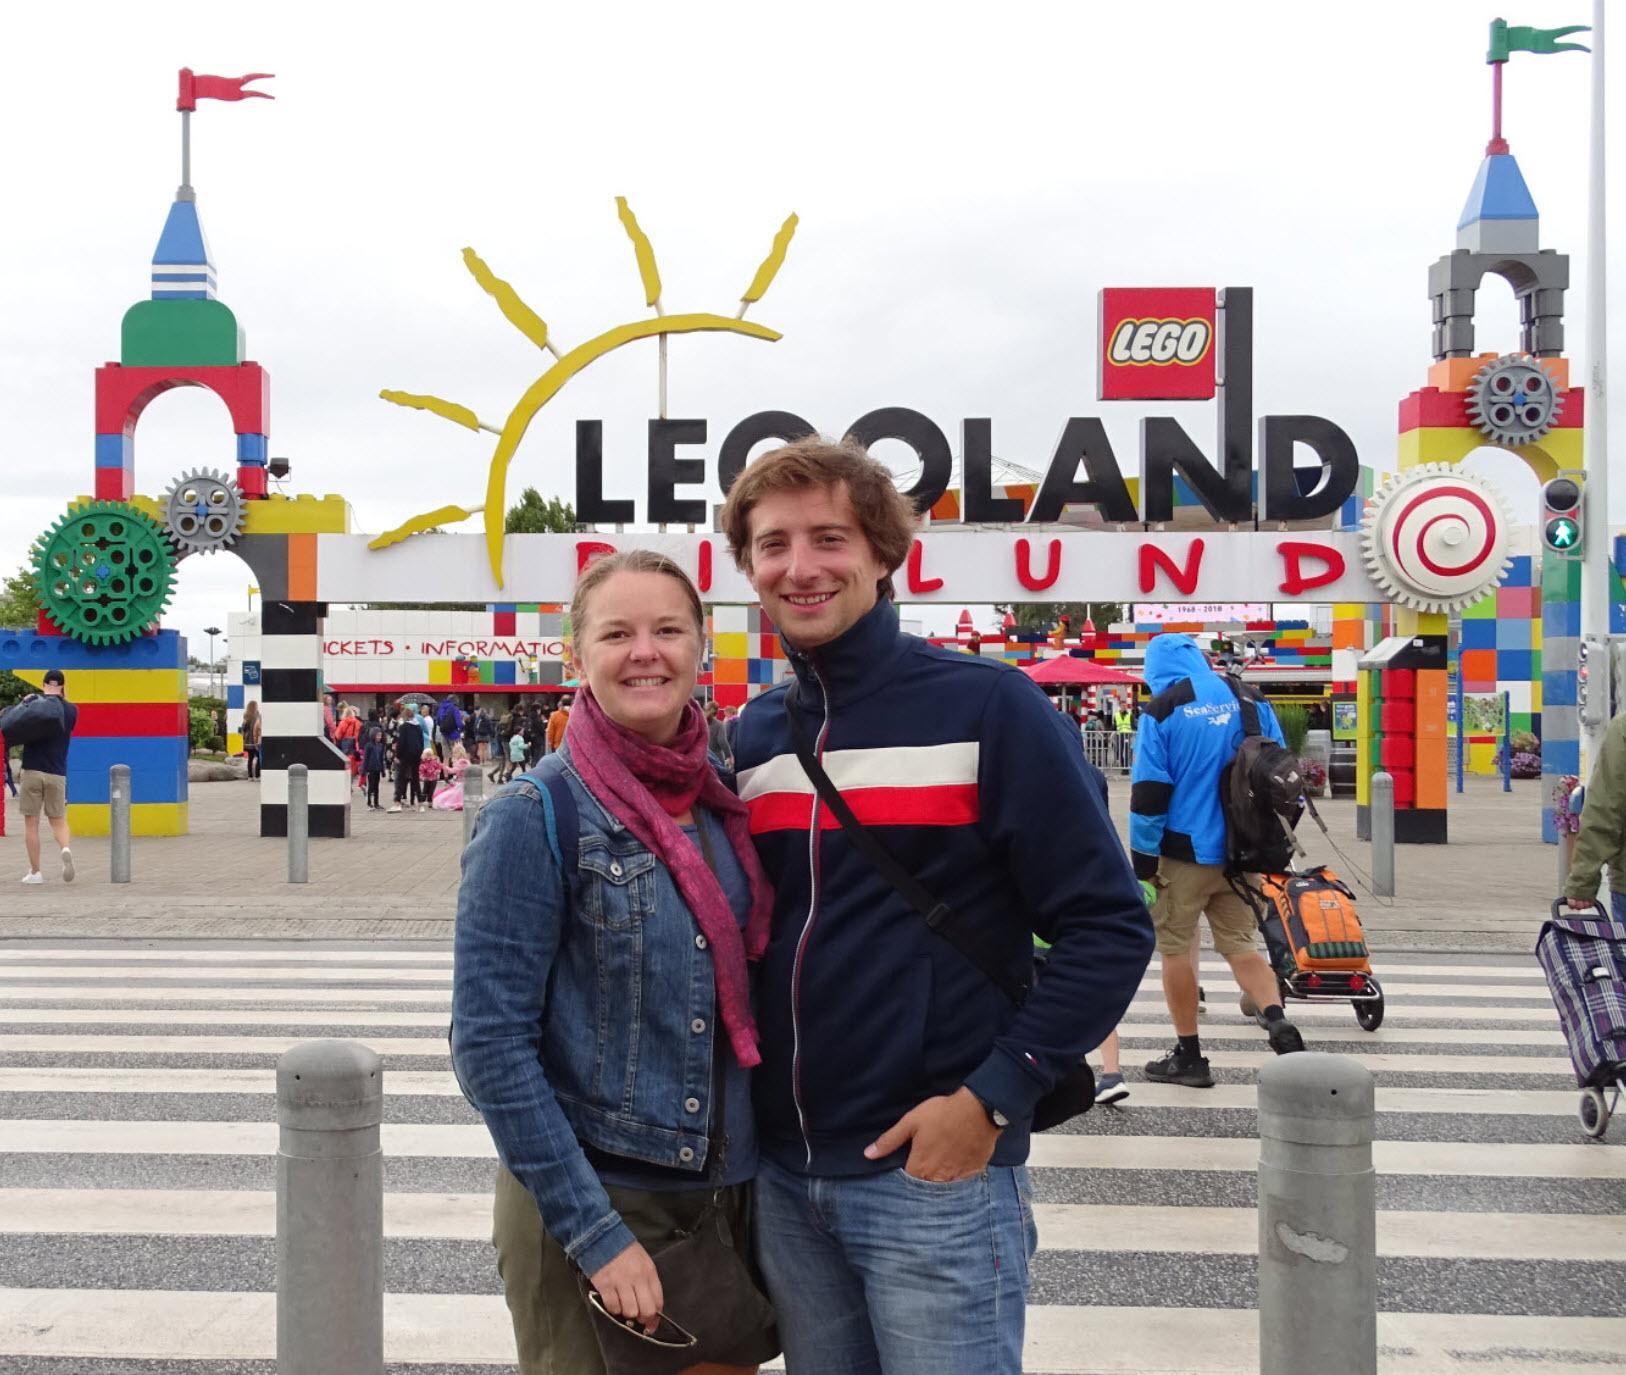 Legoland billund denemarken lego